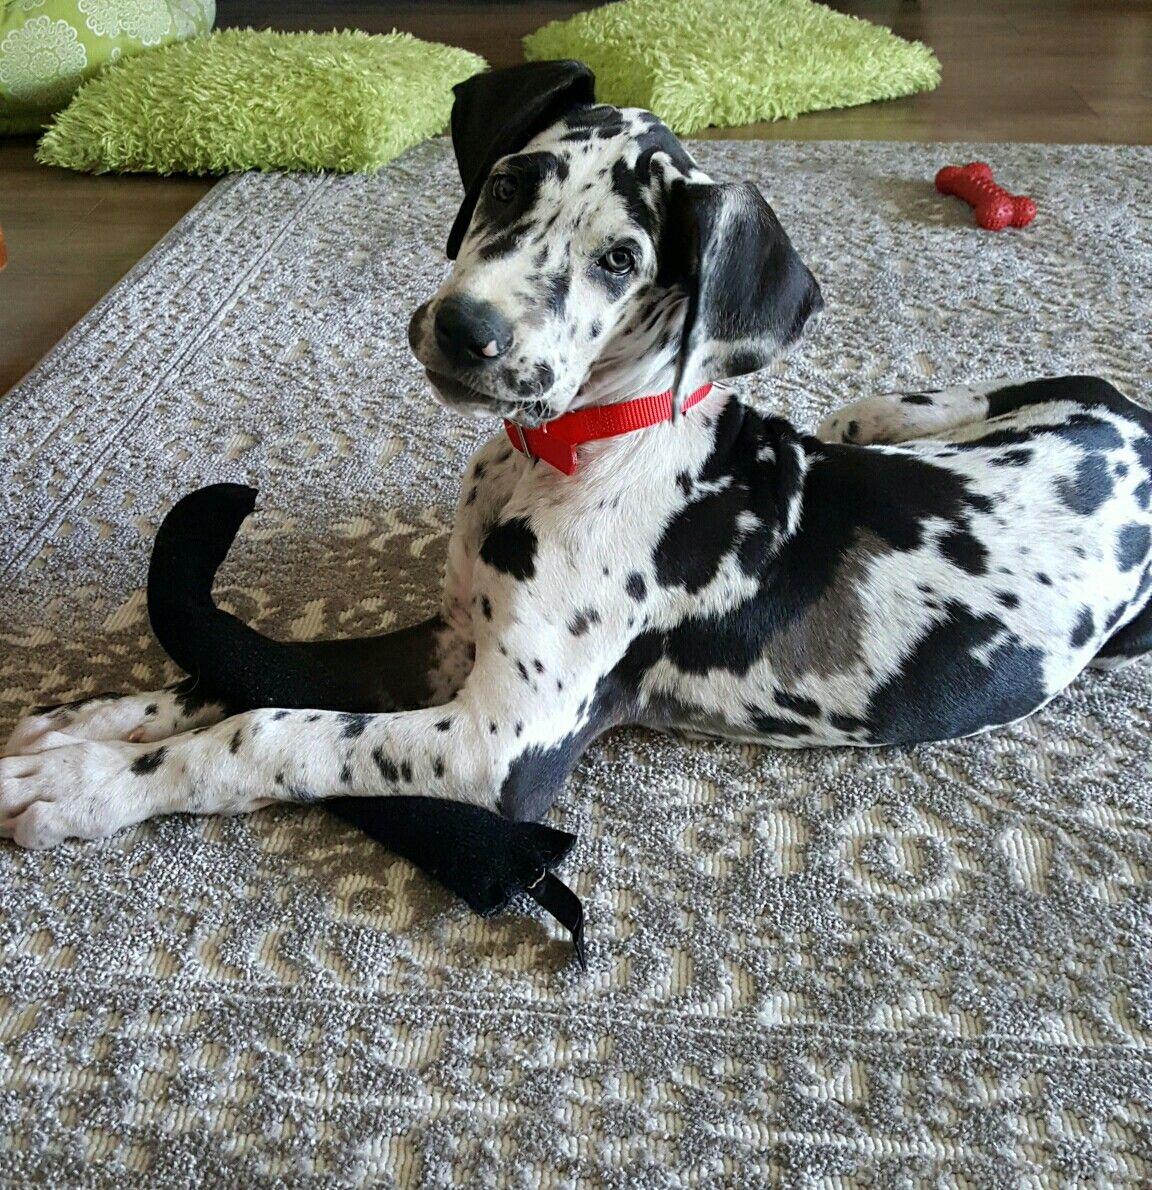 Harlequin Great Dane puppy | Great Danes | Pinterest | Dane ...